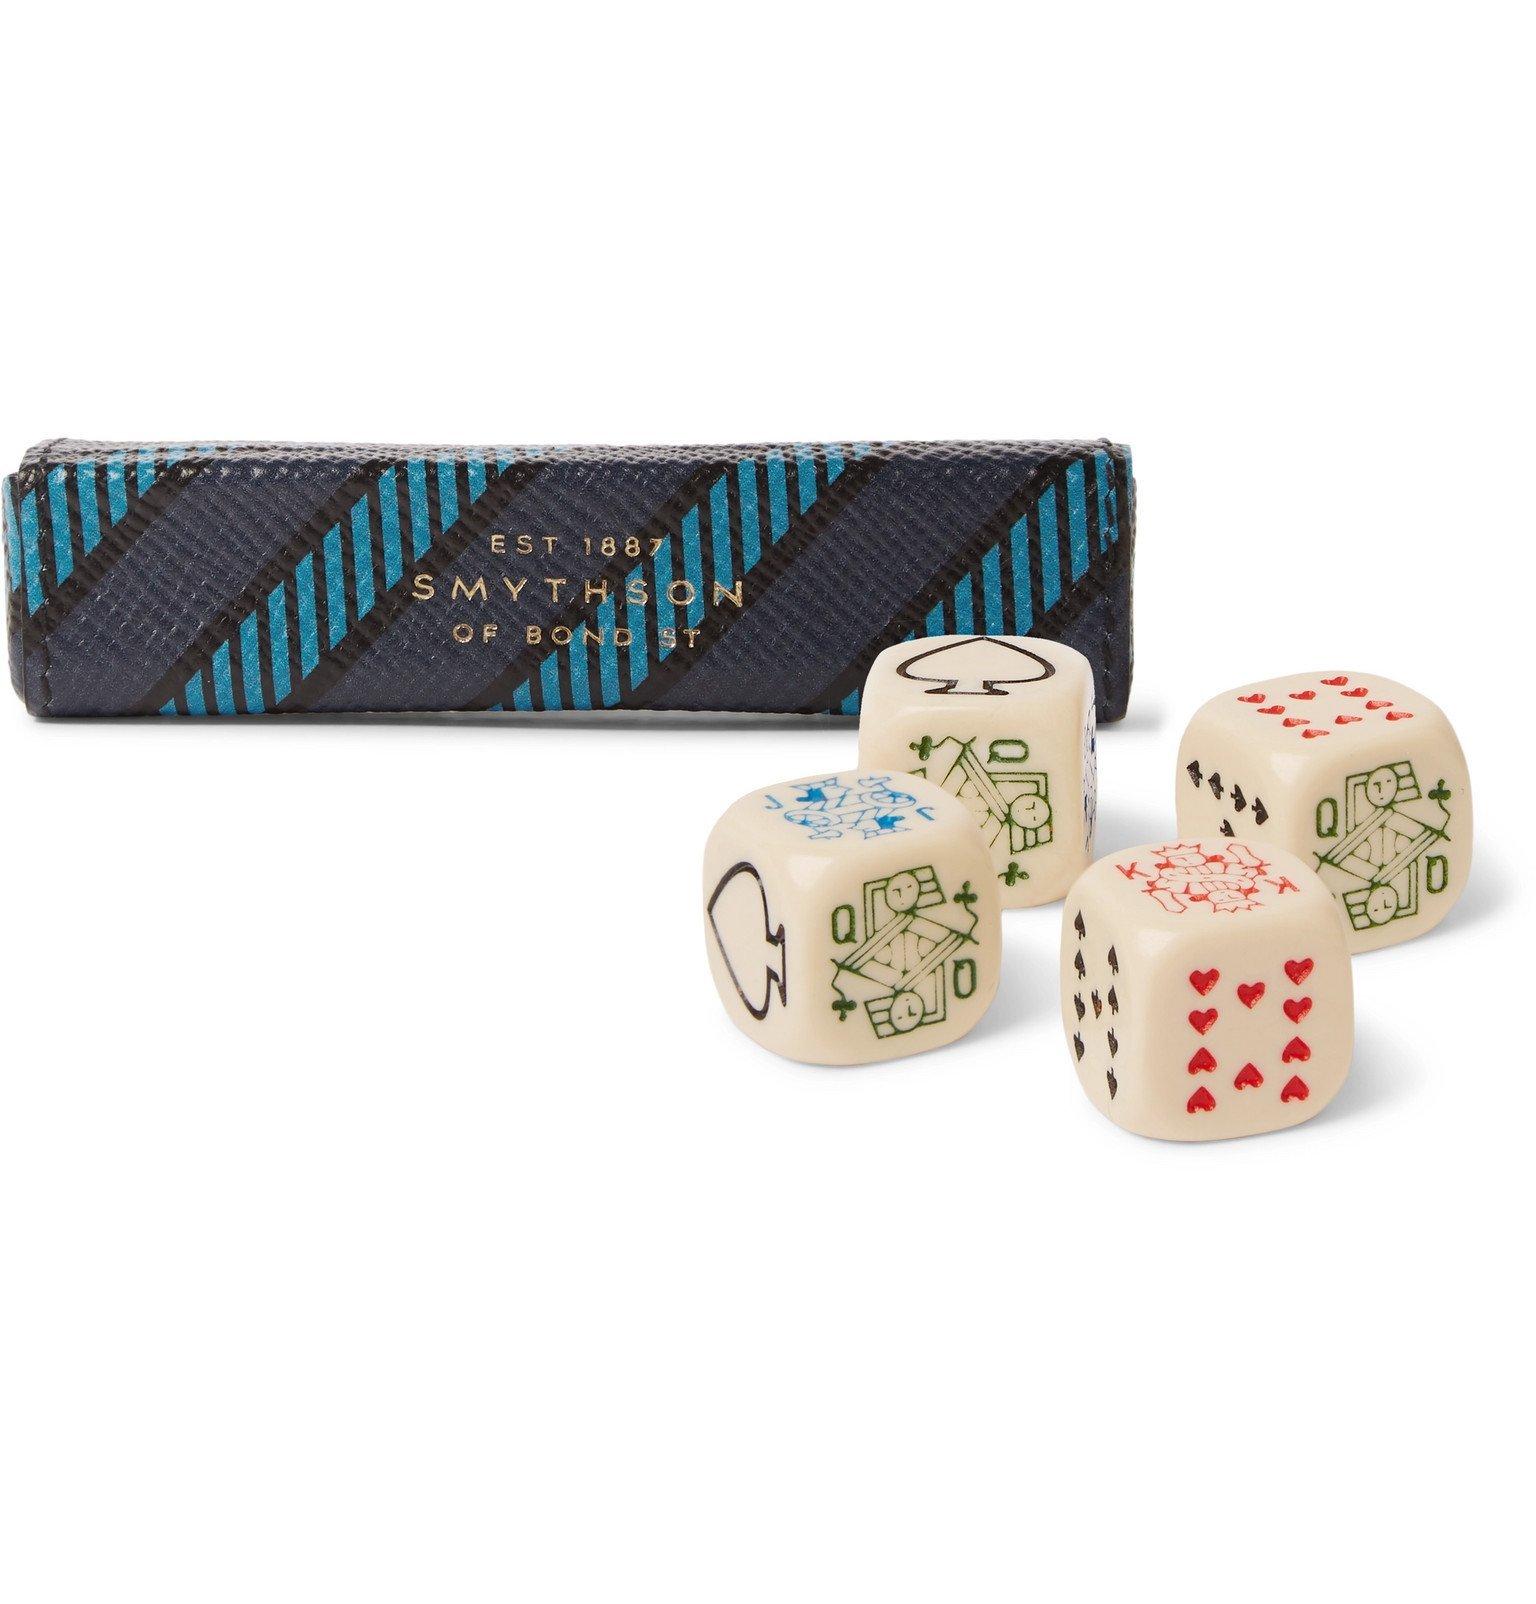 Smythson - Panama Poker Dice - Multi